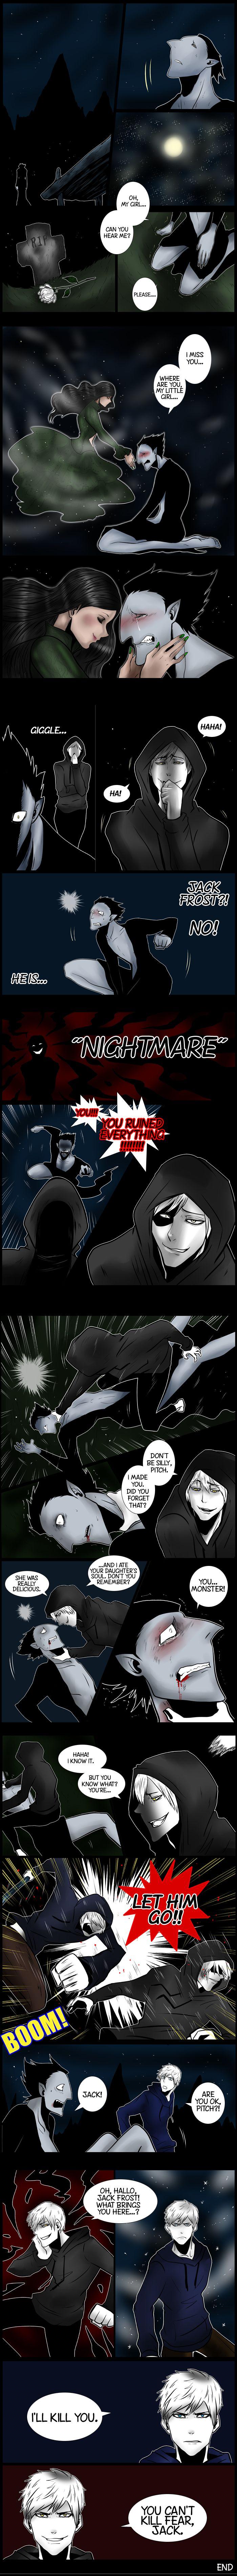 Rise Of The Guardians - Jack Frost VS Jack Black by mikaeriksenweiseth on DeviantArt